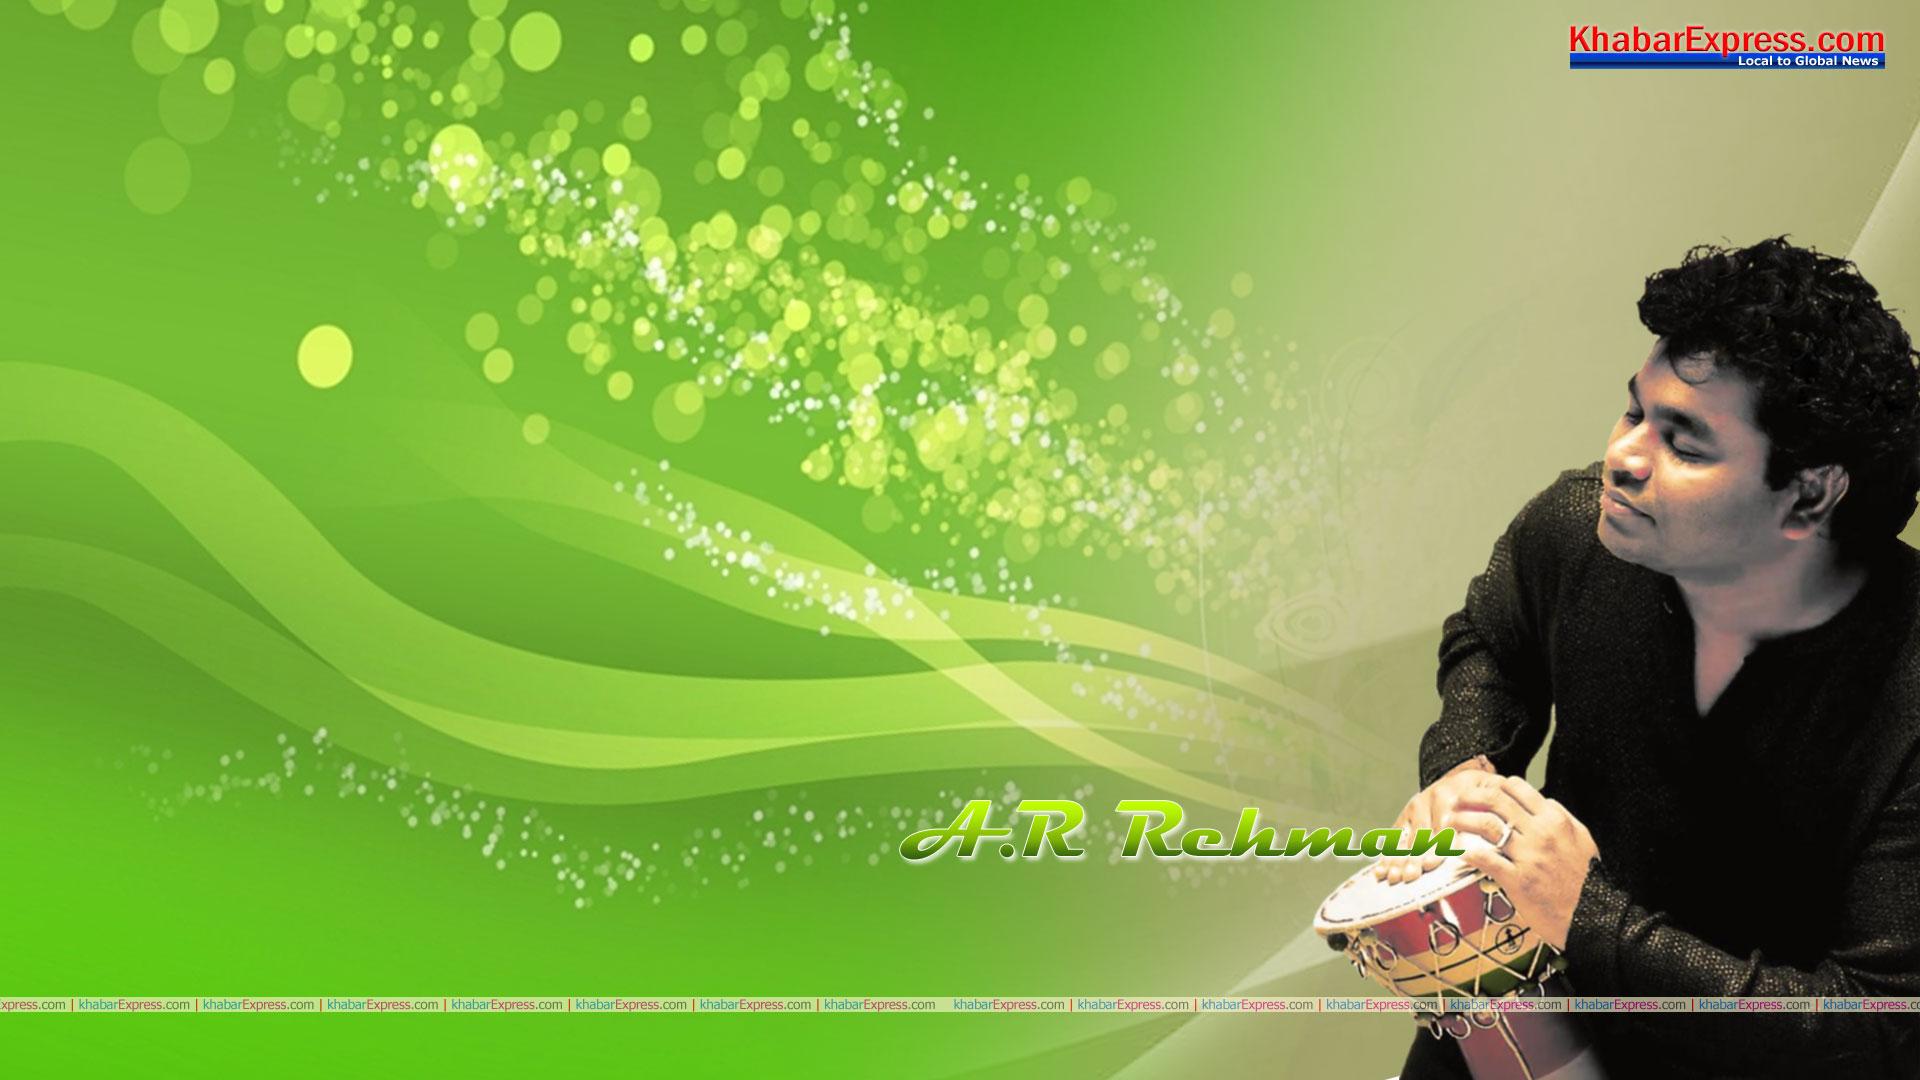 Wallpaper of Music Maestro A R Rehman